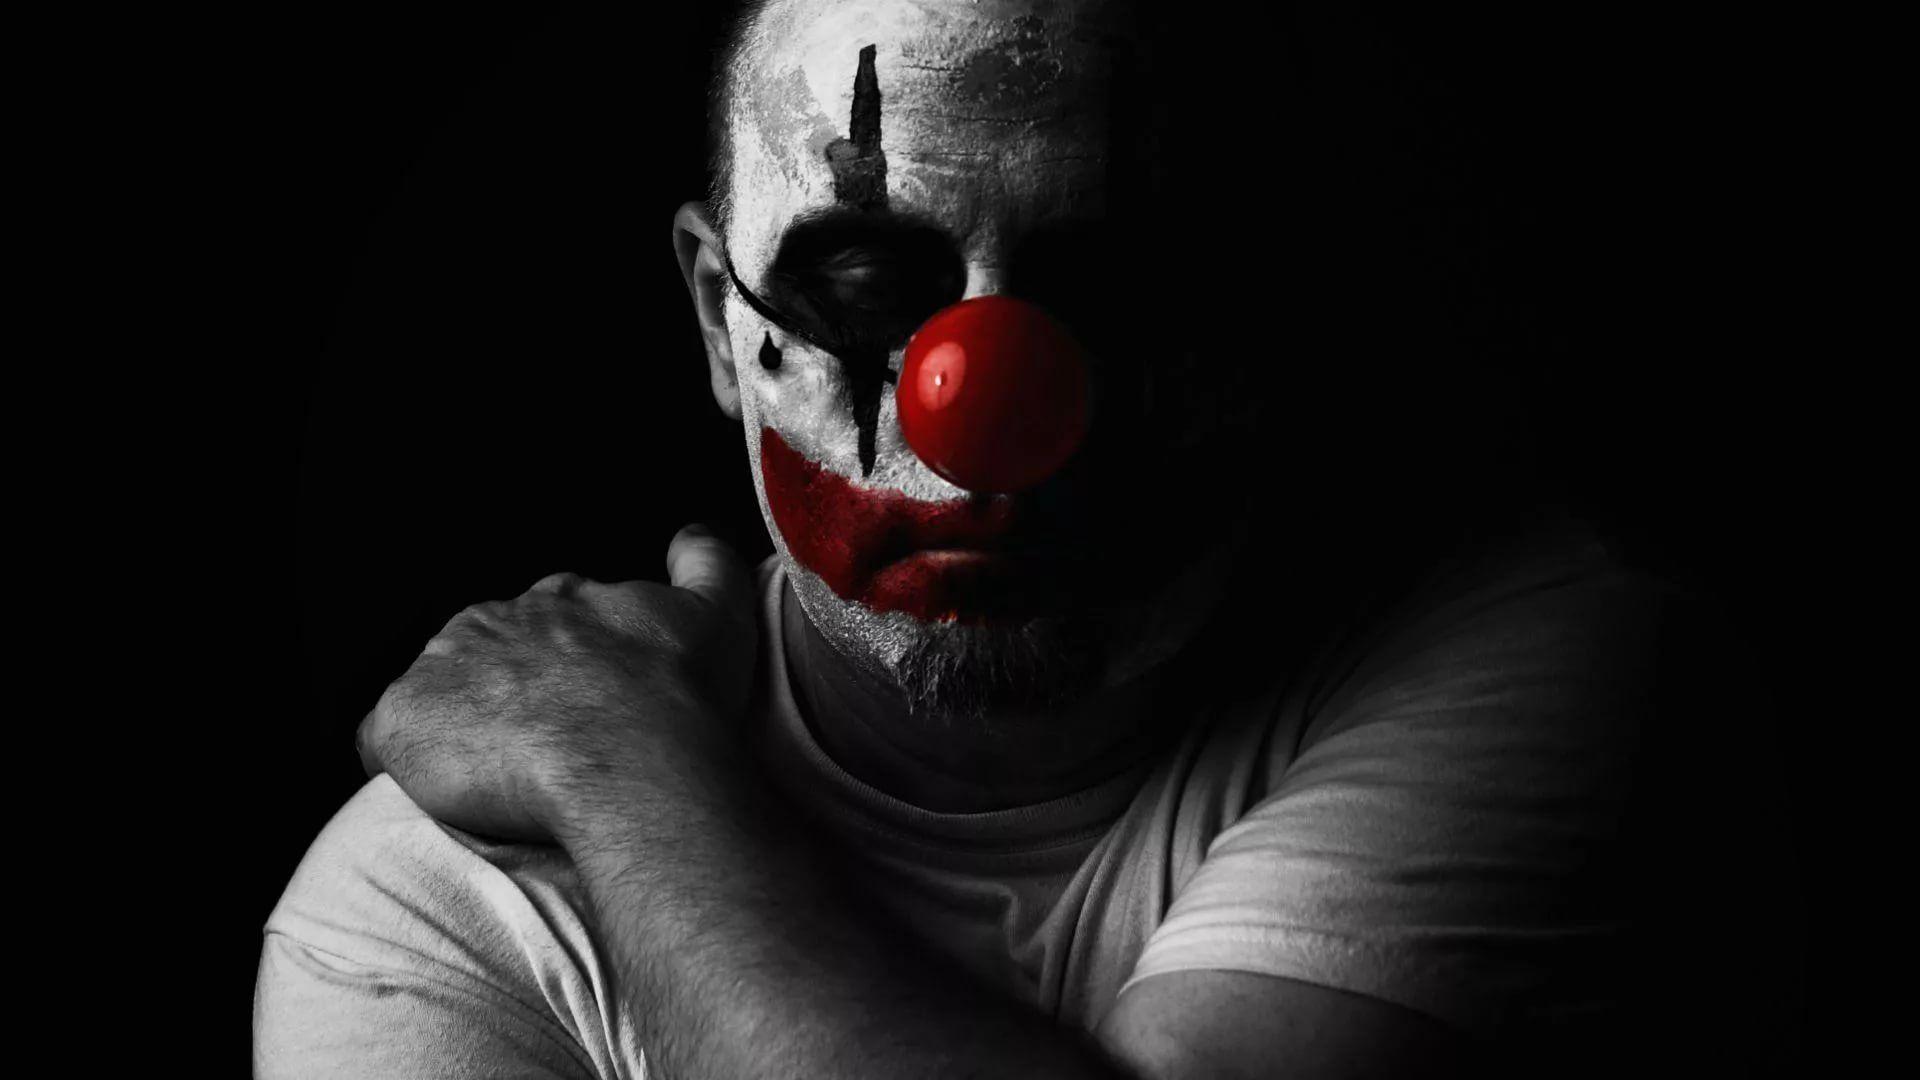 Killer Clown full hd 1080p wallpaper